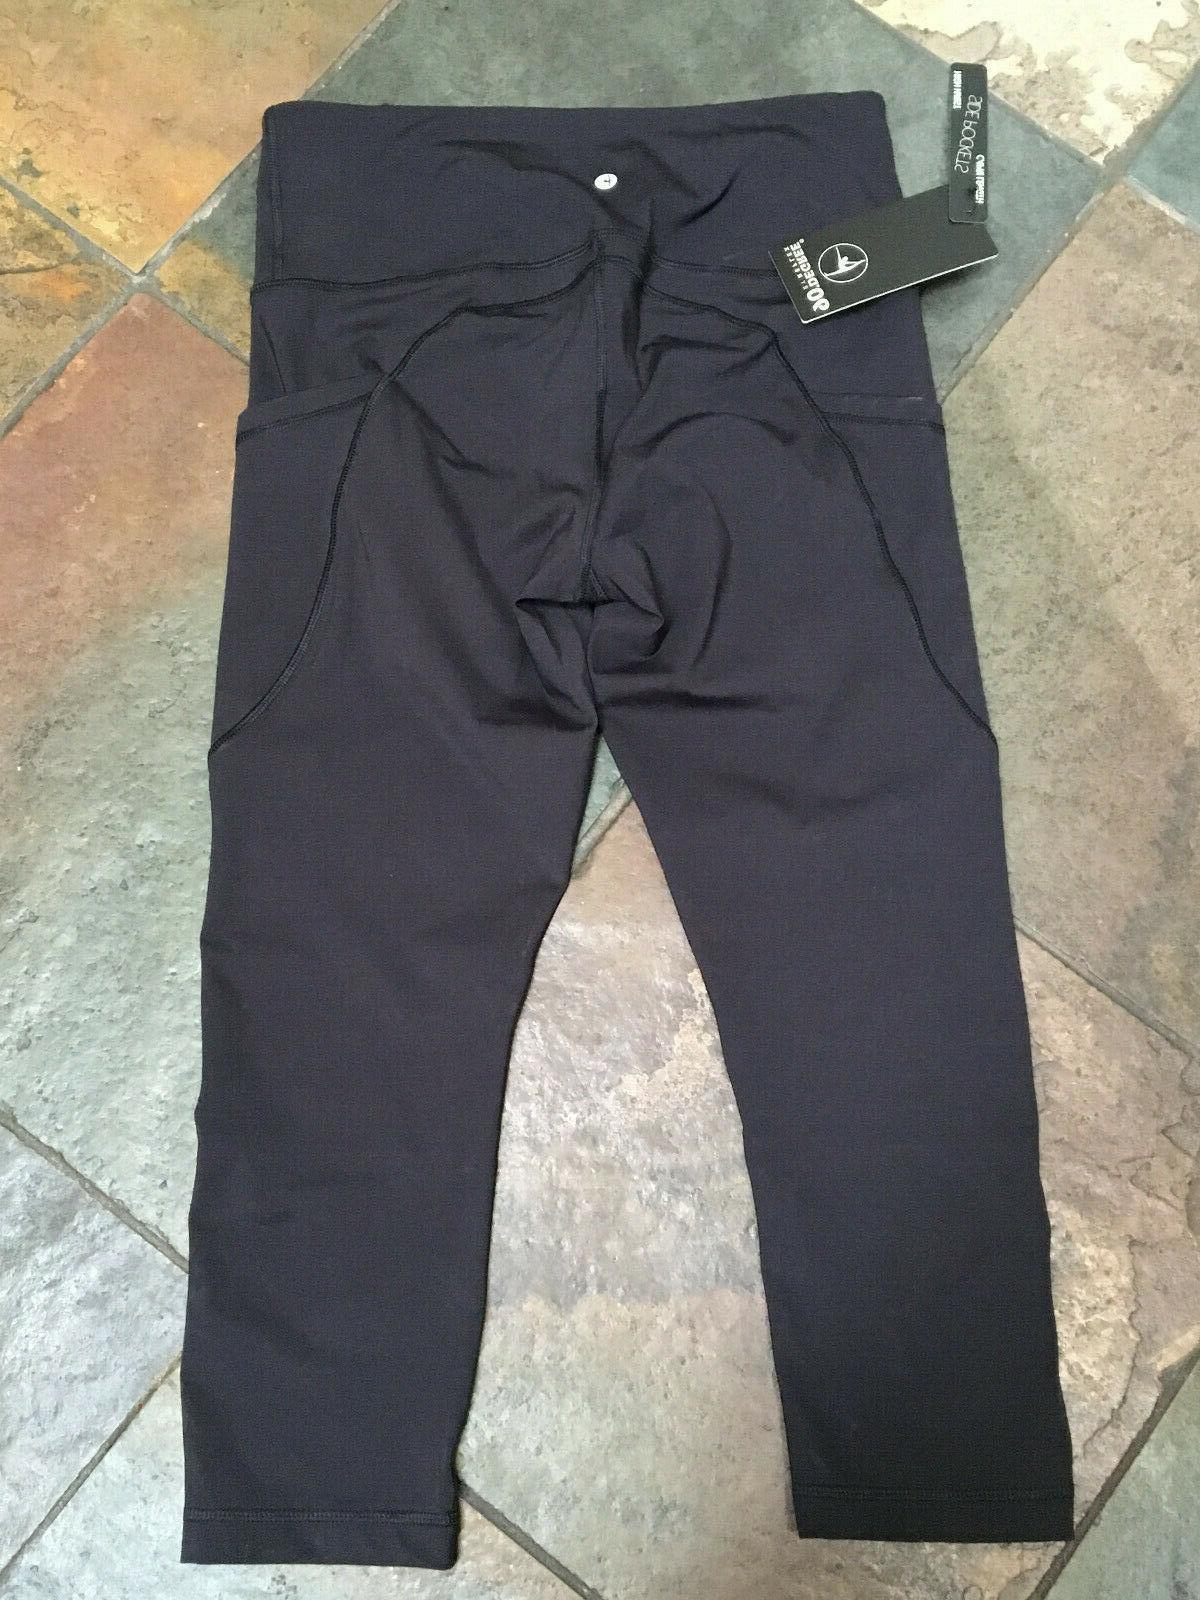 0920 90 Degree Reflex Legging Hi Waist Capri W Pockets #CW62391 NWT B